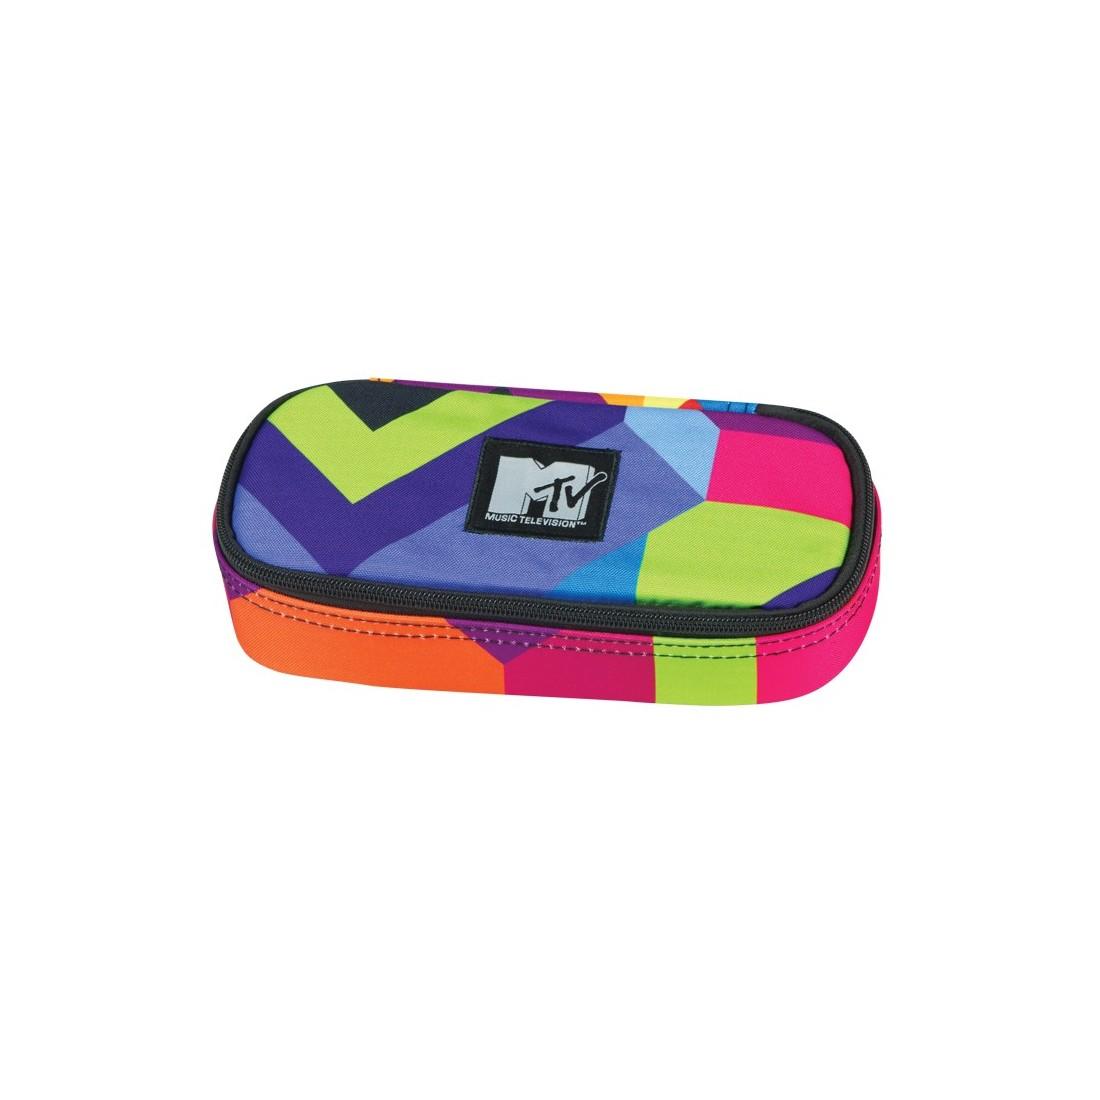 Piórnik Coolpack MTV Colors - plecak-tornister.pl